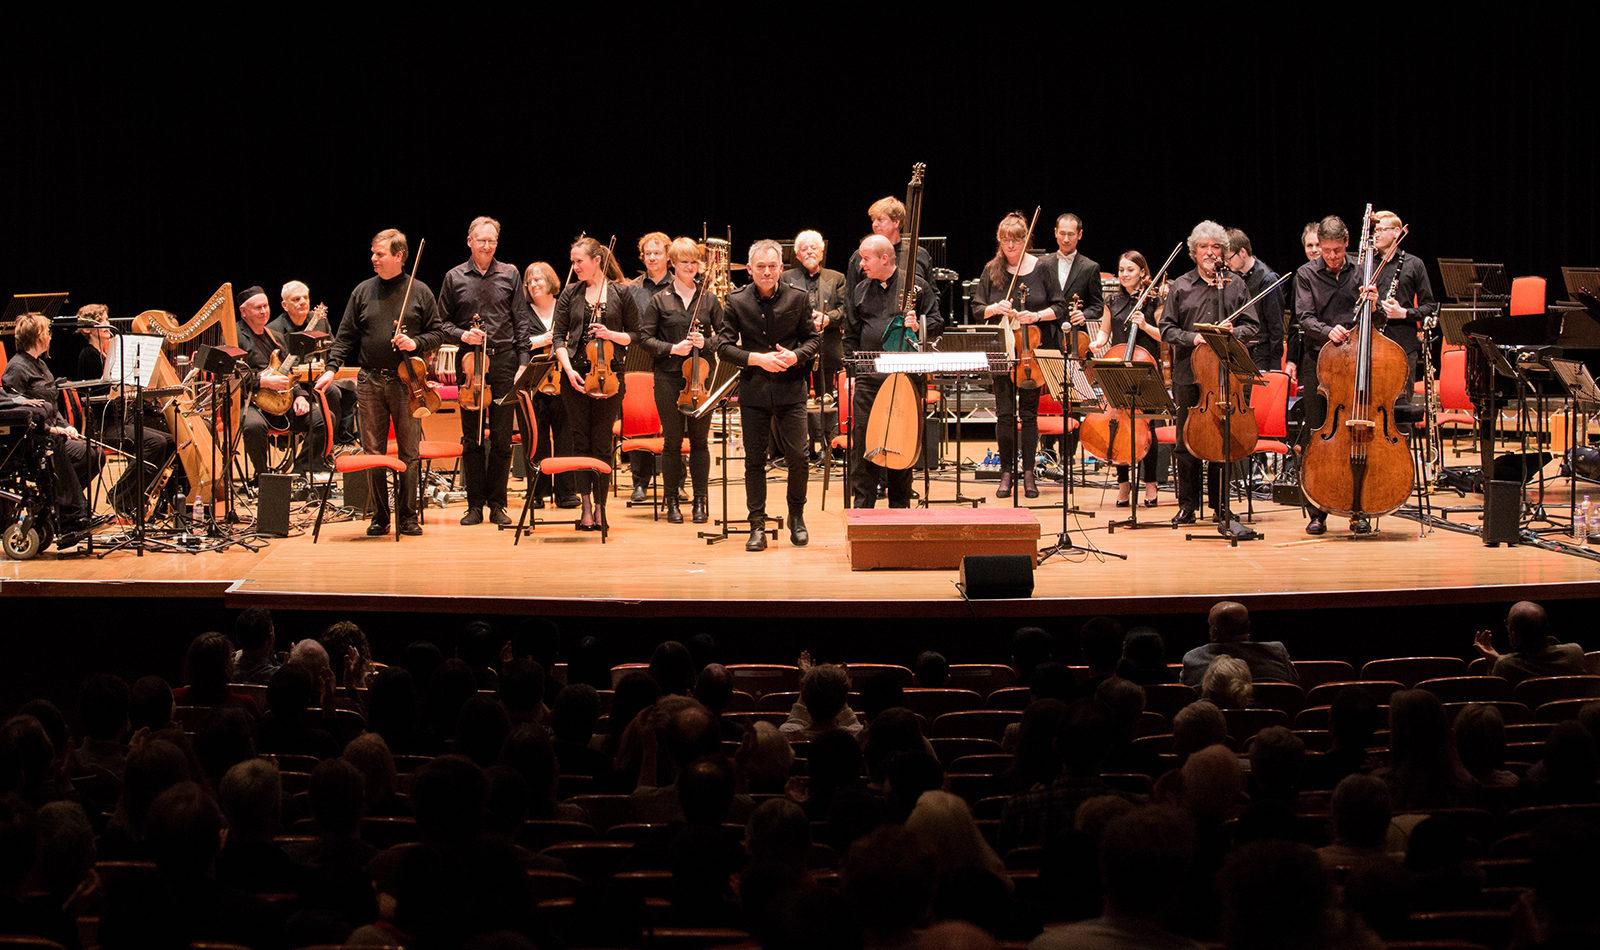 Photo of British Paraorchestra Birmingham on stage at Symphony Hall, full ensemble, Charles Hazlewood centre front